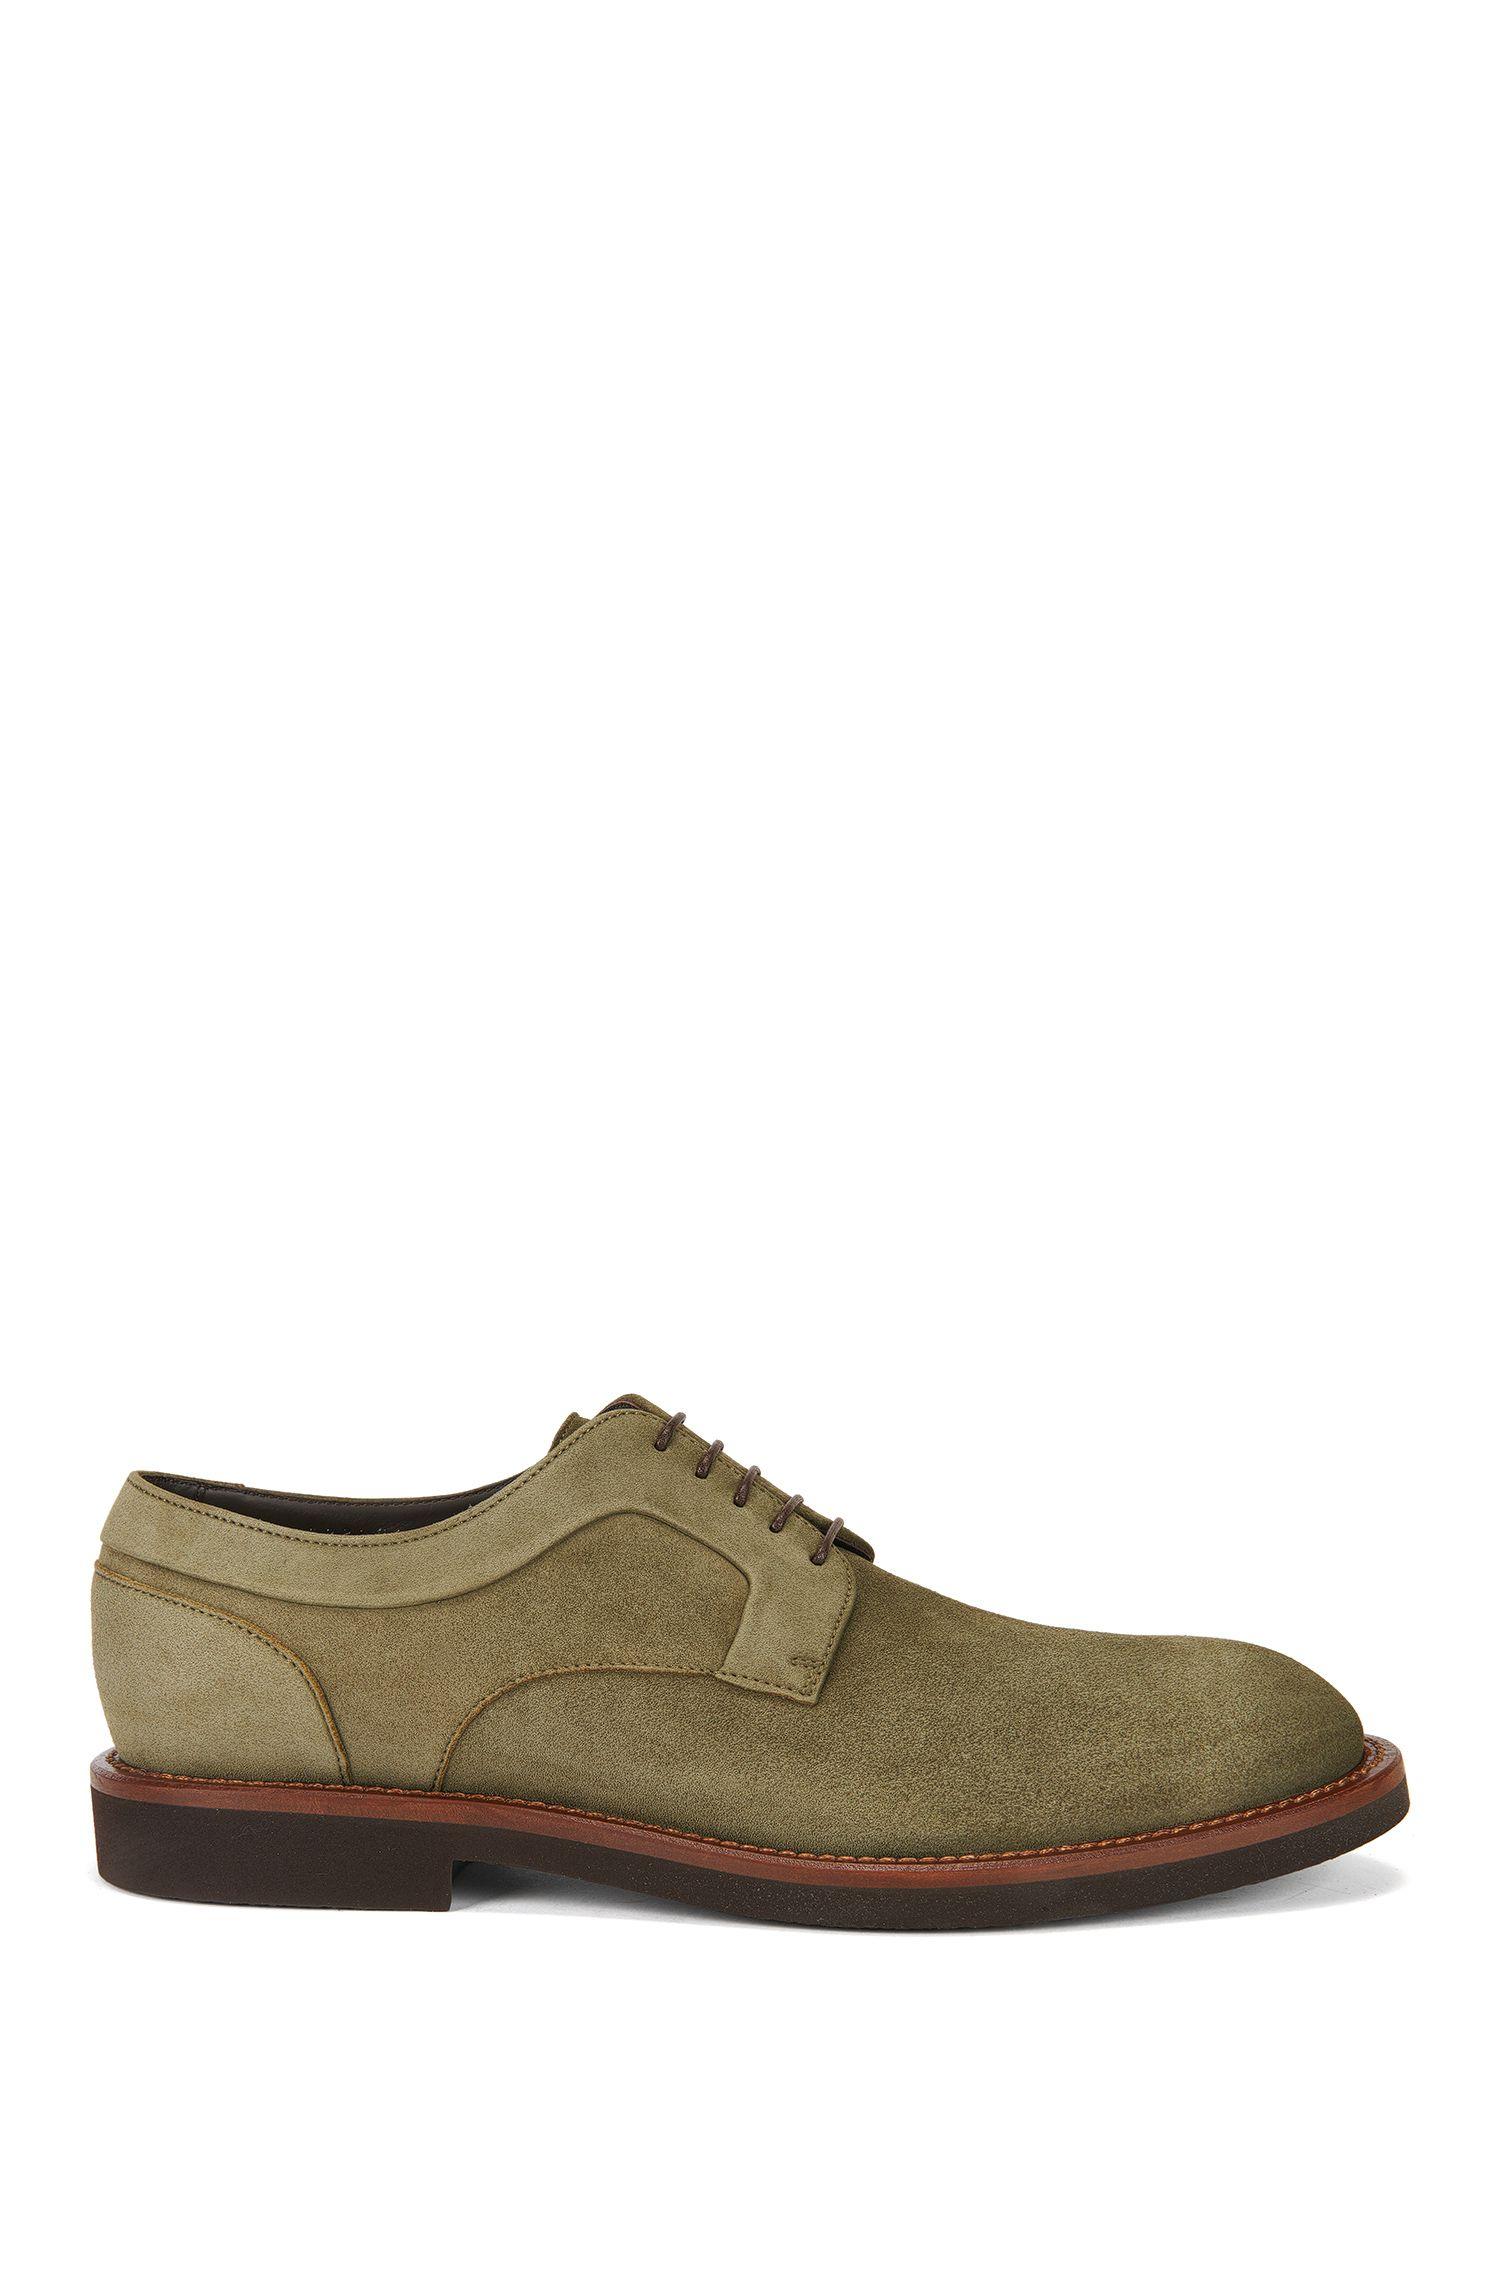 Nubuck Leather Derby Shoes | Eden Derb Sdg